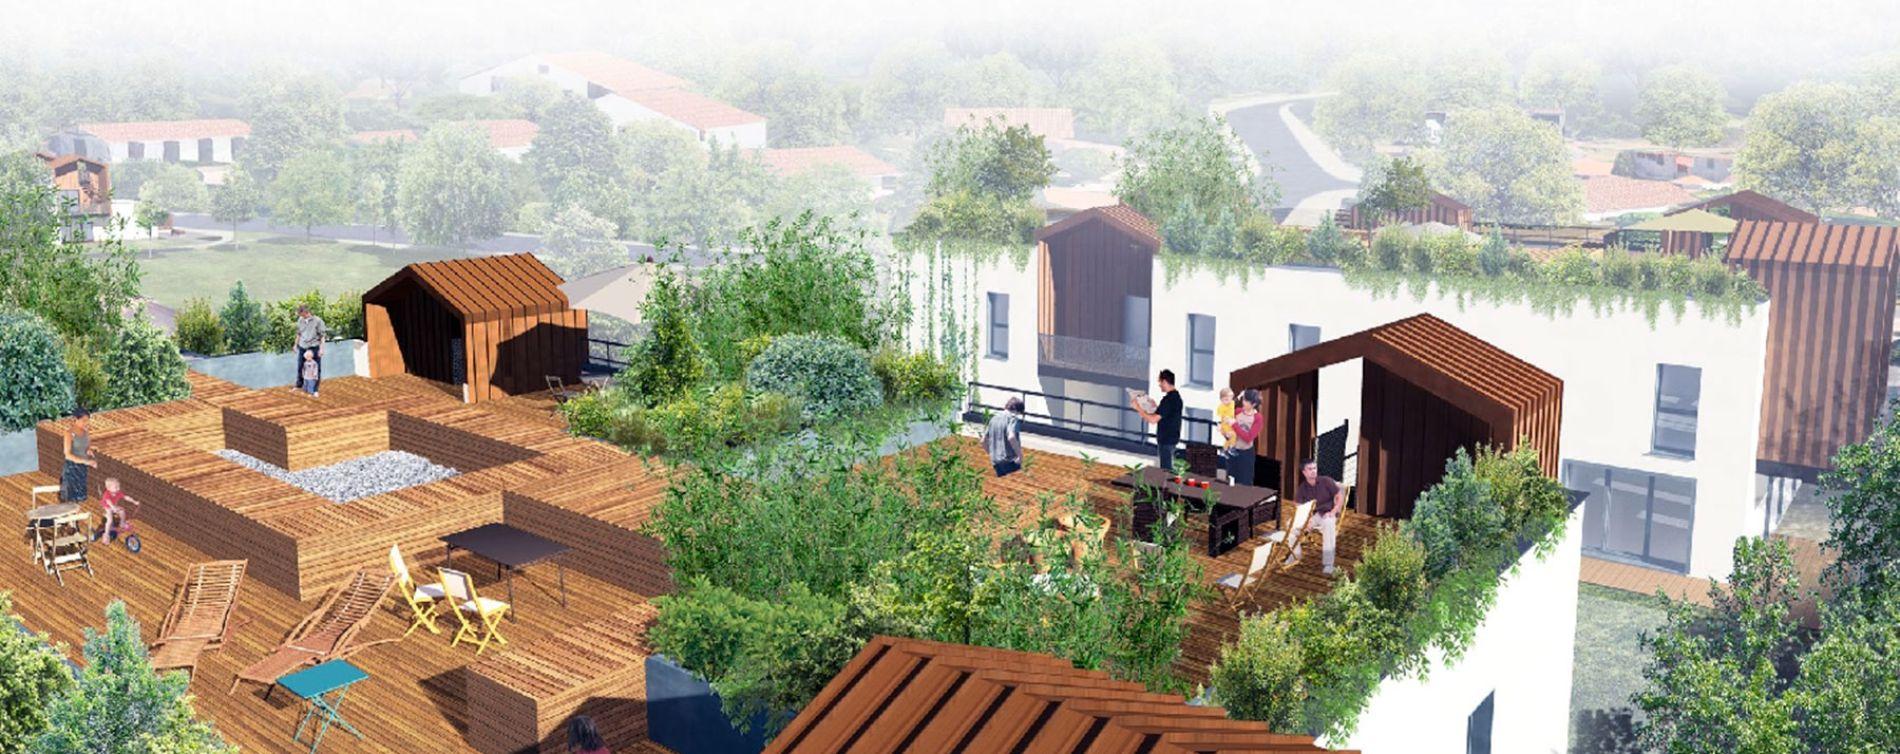 Résidence So Green à Saint-Médard-en-Jalles